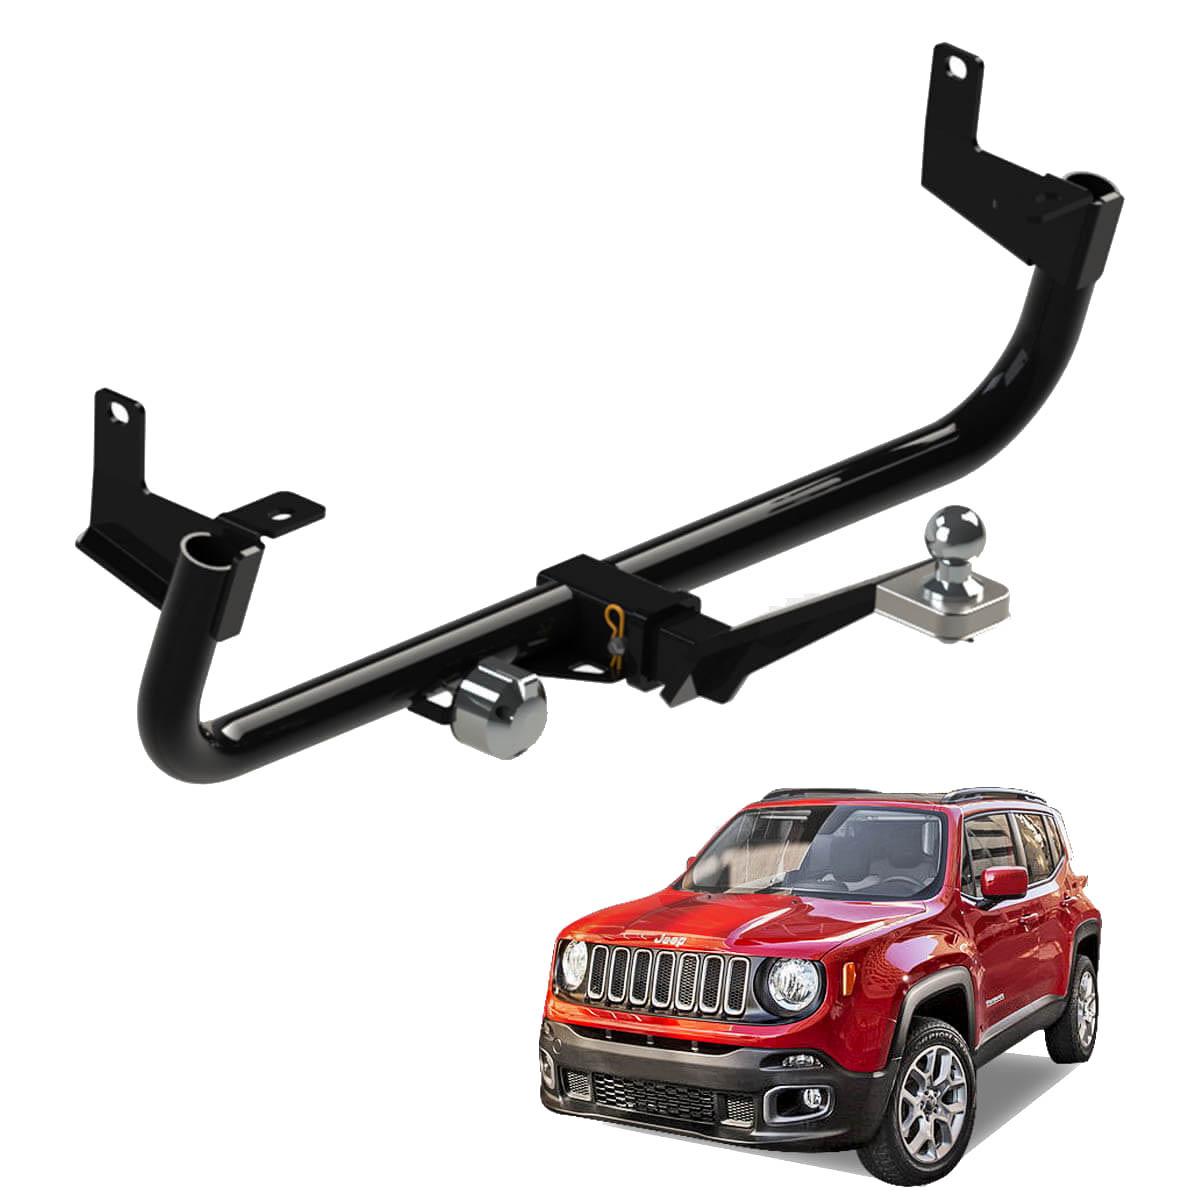 Engate de reboque Jeep Renegade 2016 2017 2018 2019 Gedeval removível 700 kg